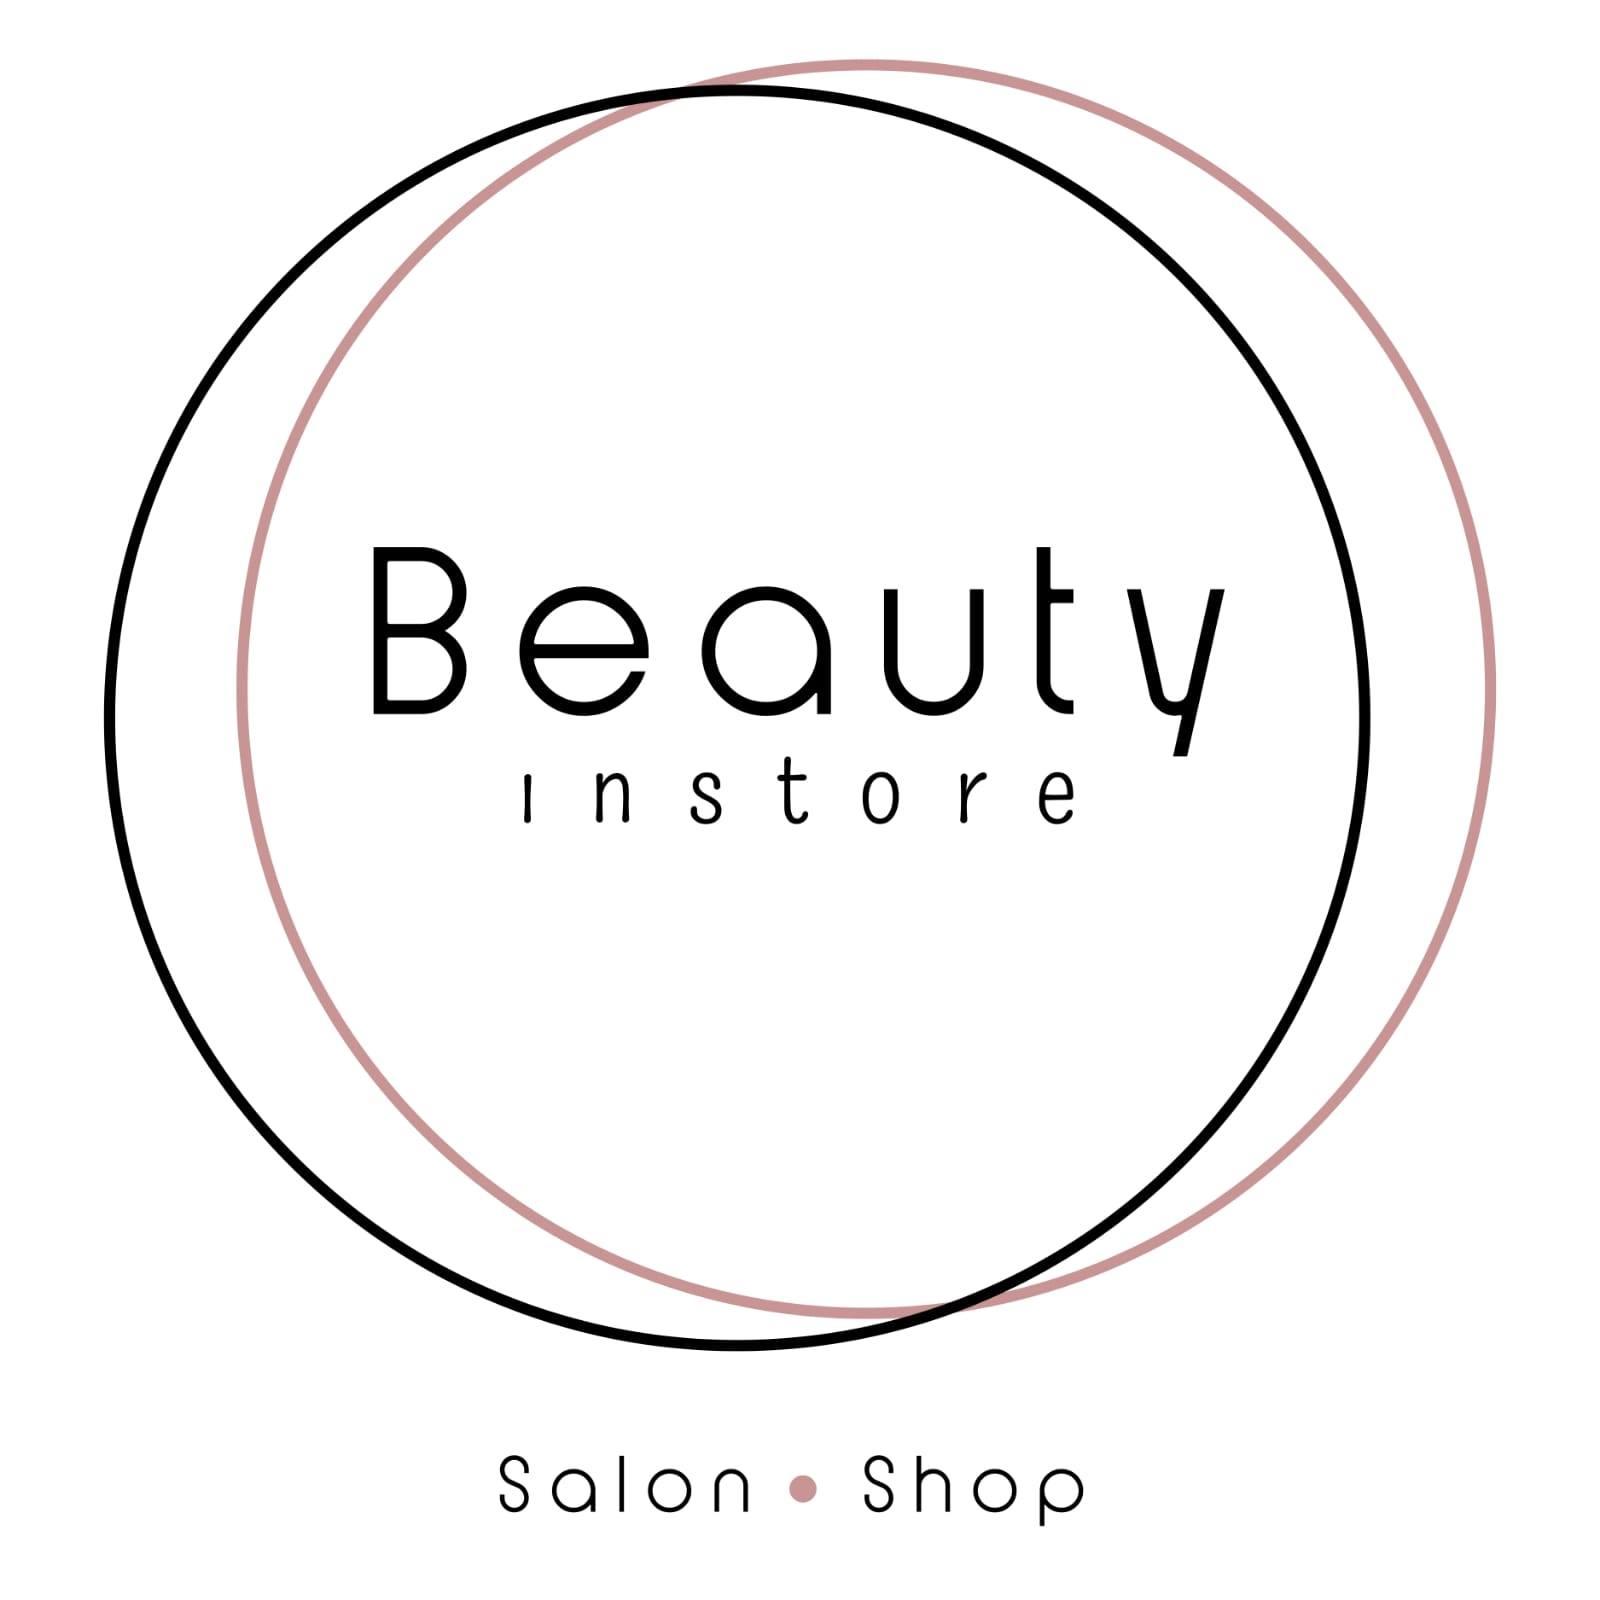 Beauty instore logo